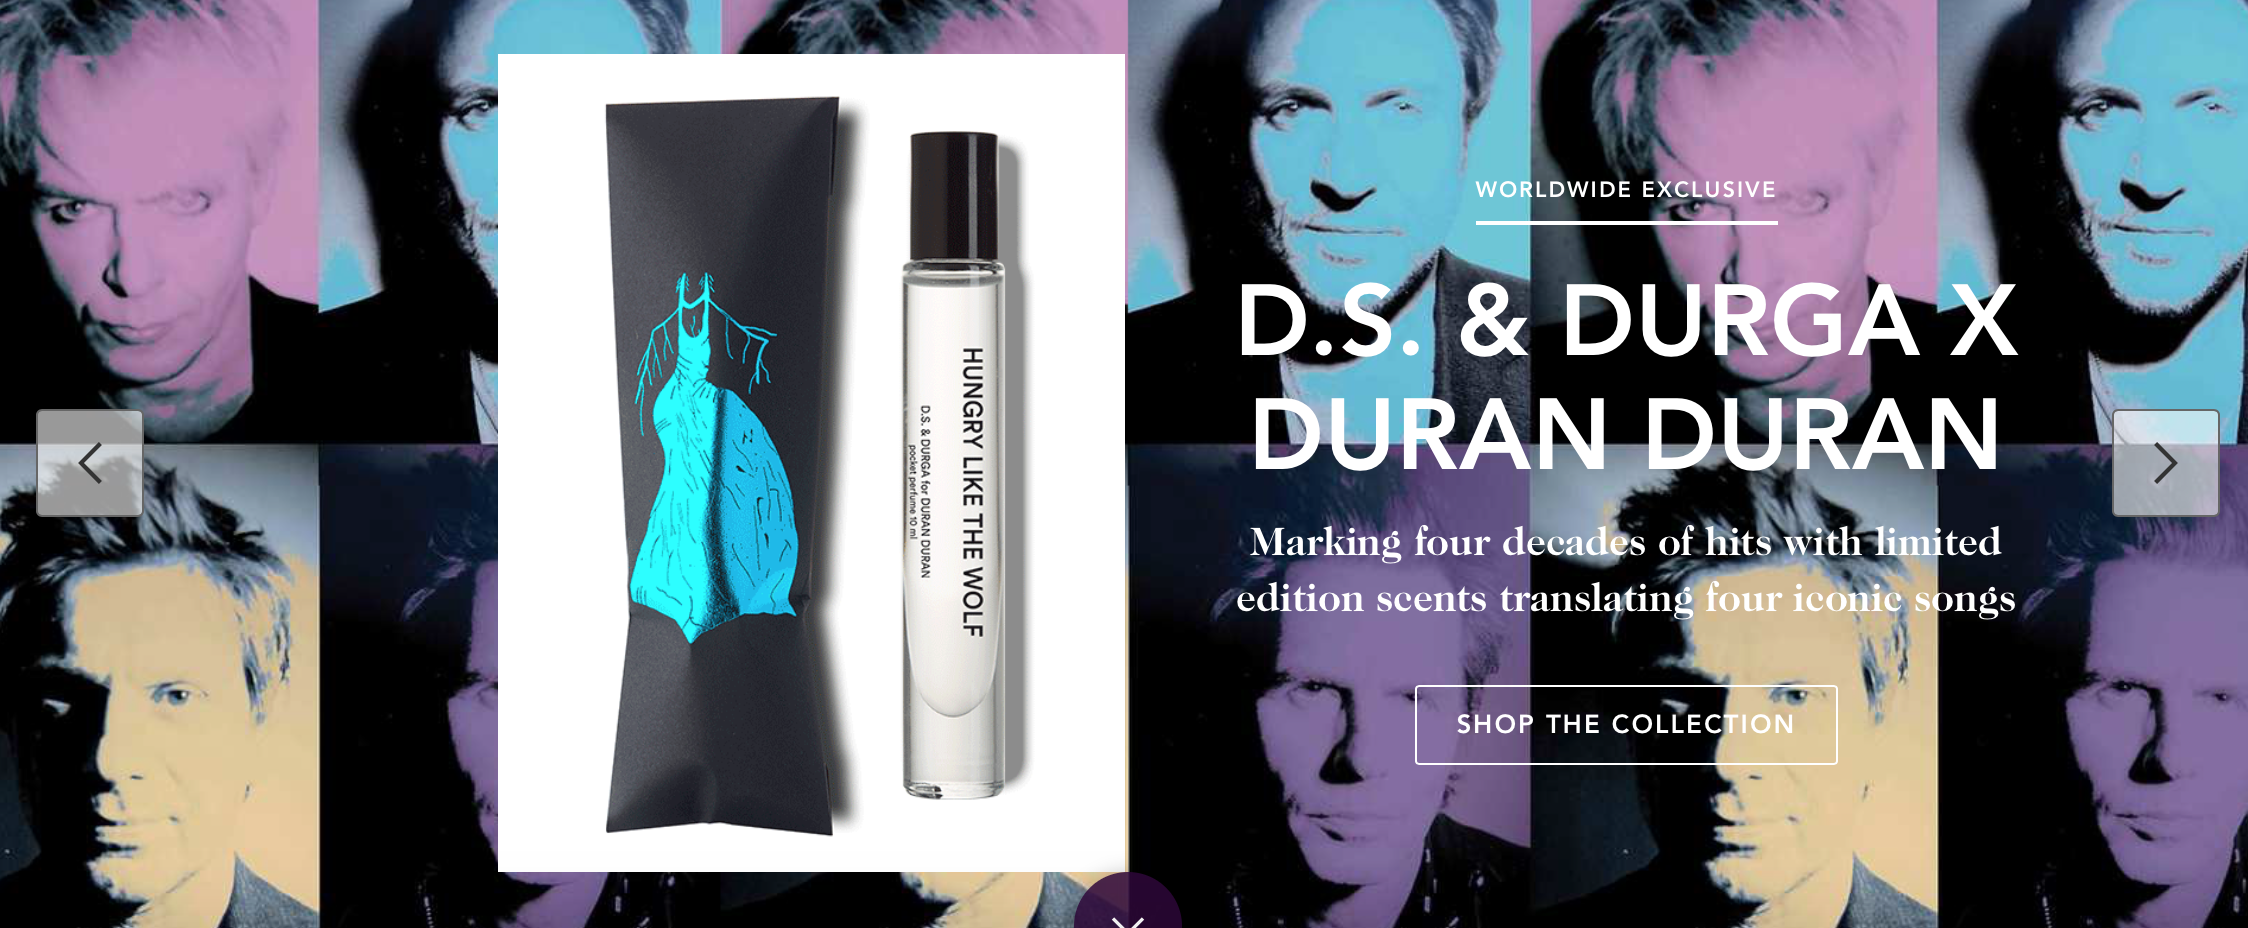 x Duran Duran Skin Divers Pocket